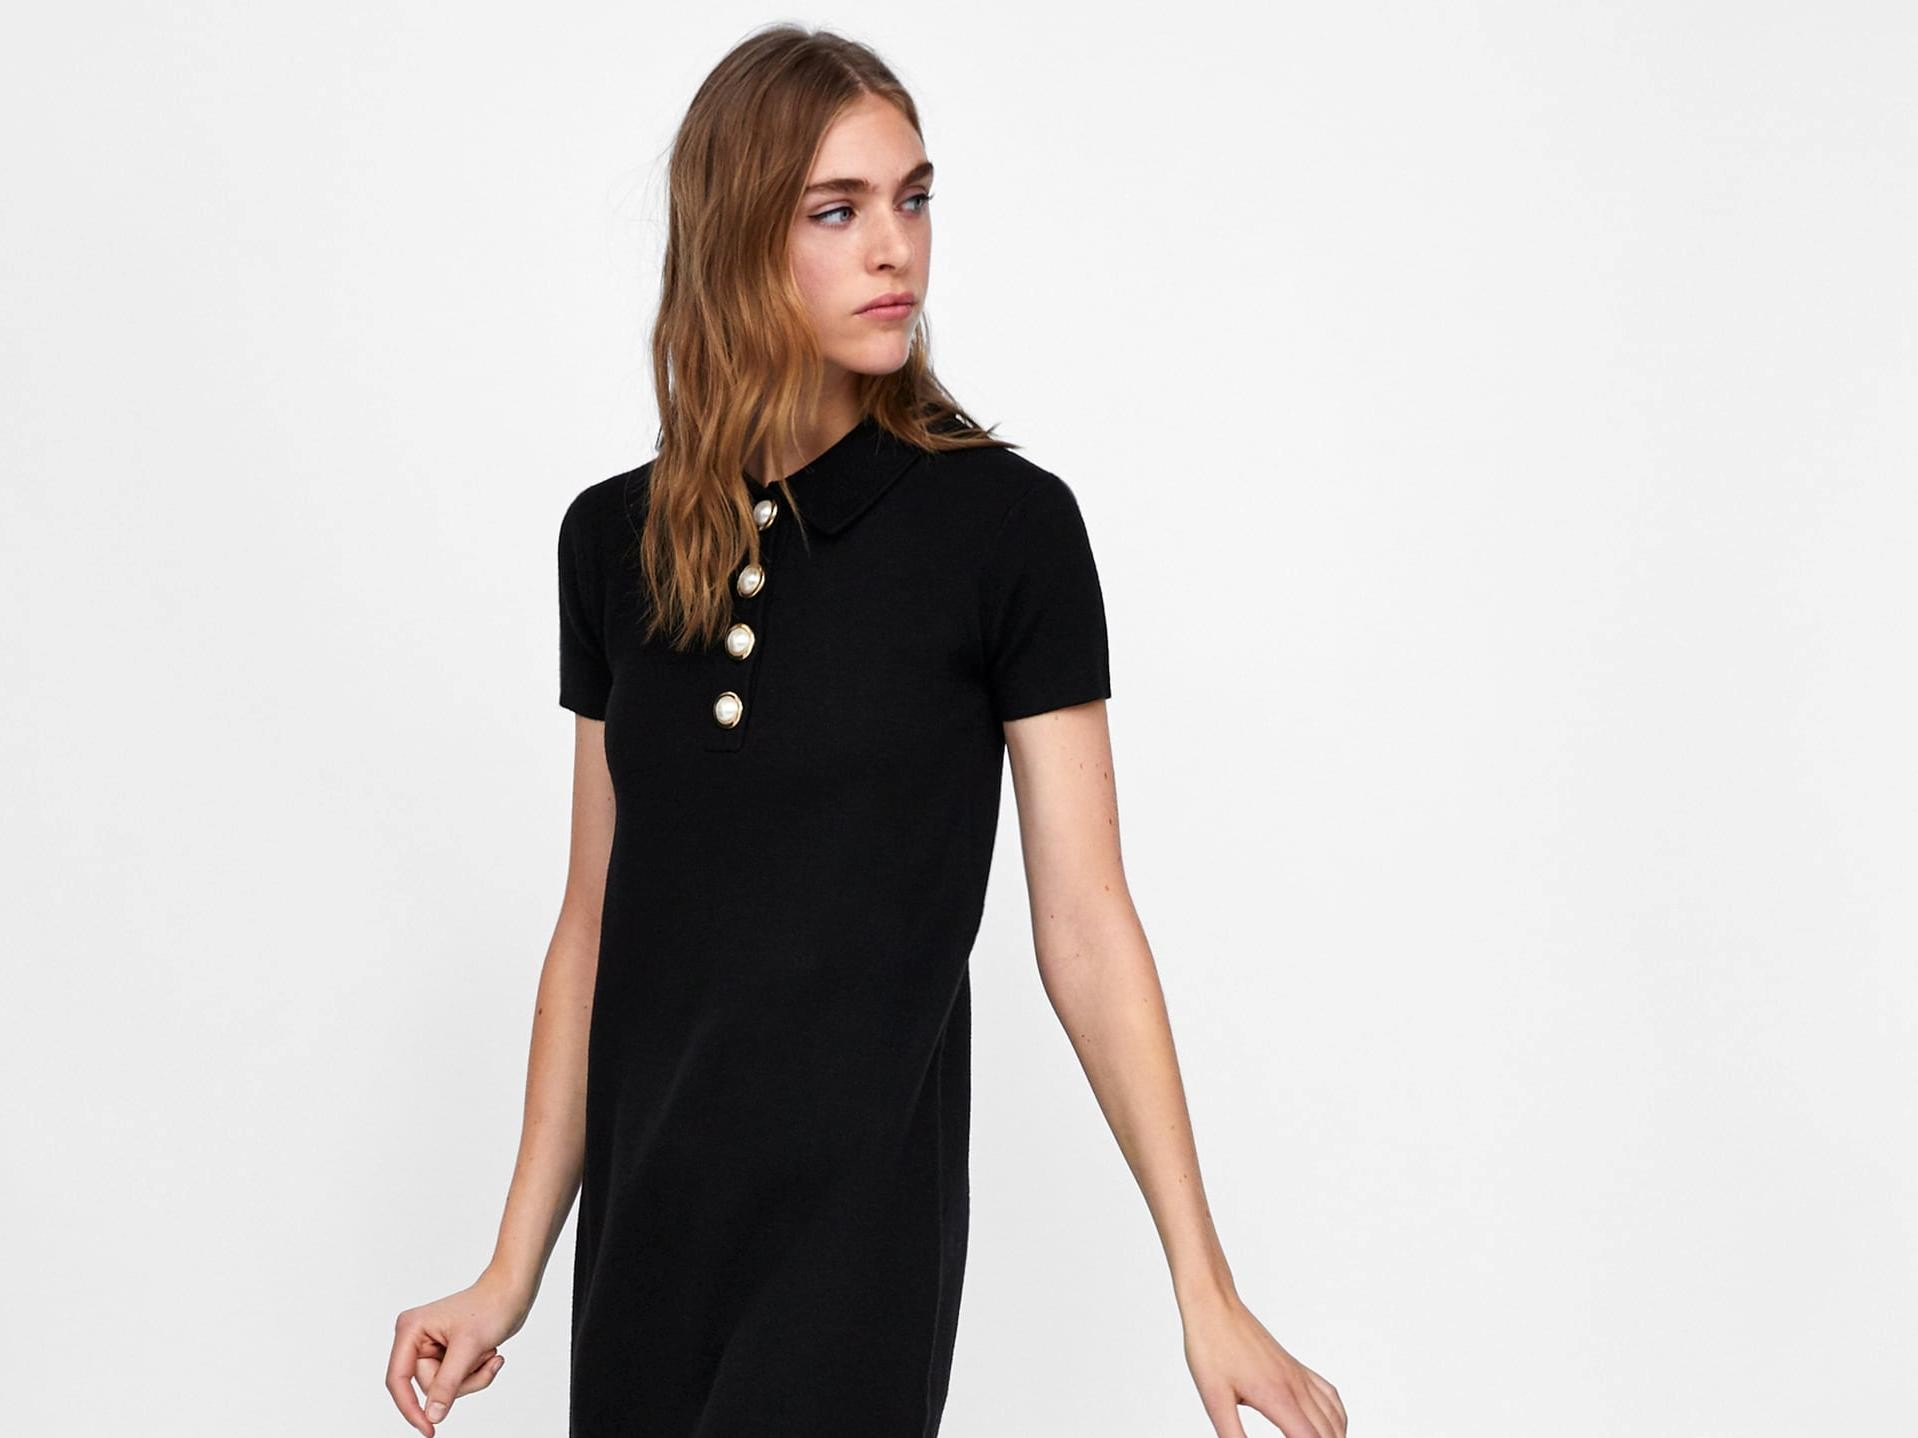 ZARA  15 υπέροχα μαύρα φορέματα για τις φθινοπωρινές σας εμφανίσεις ... cd2d9a2e8c9